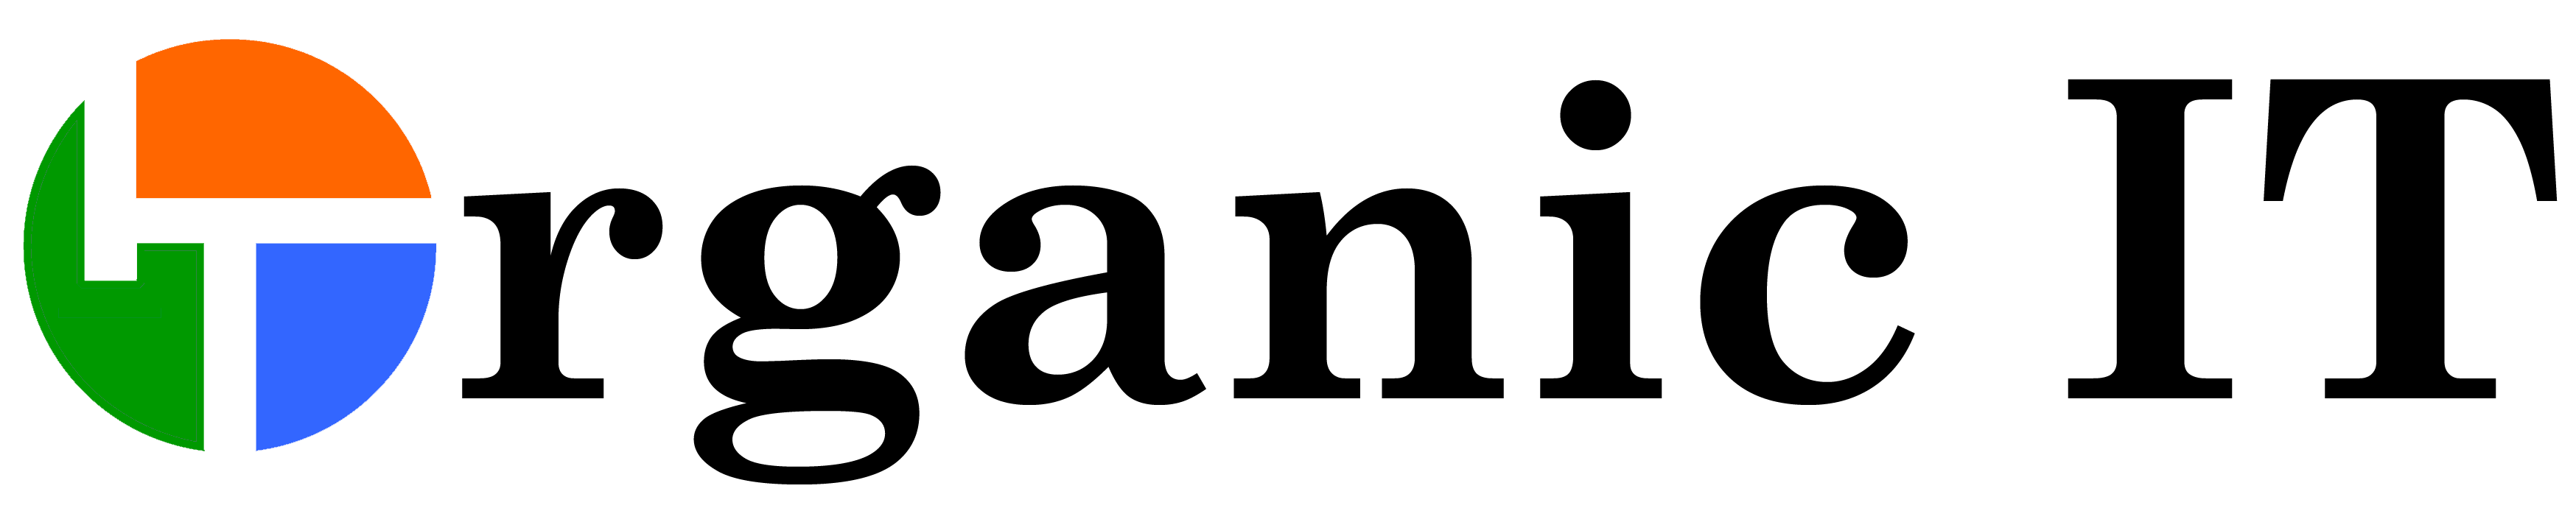 Organic IT logo